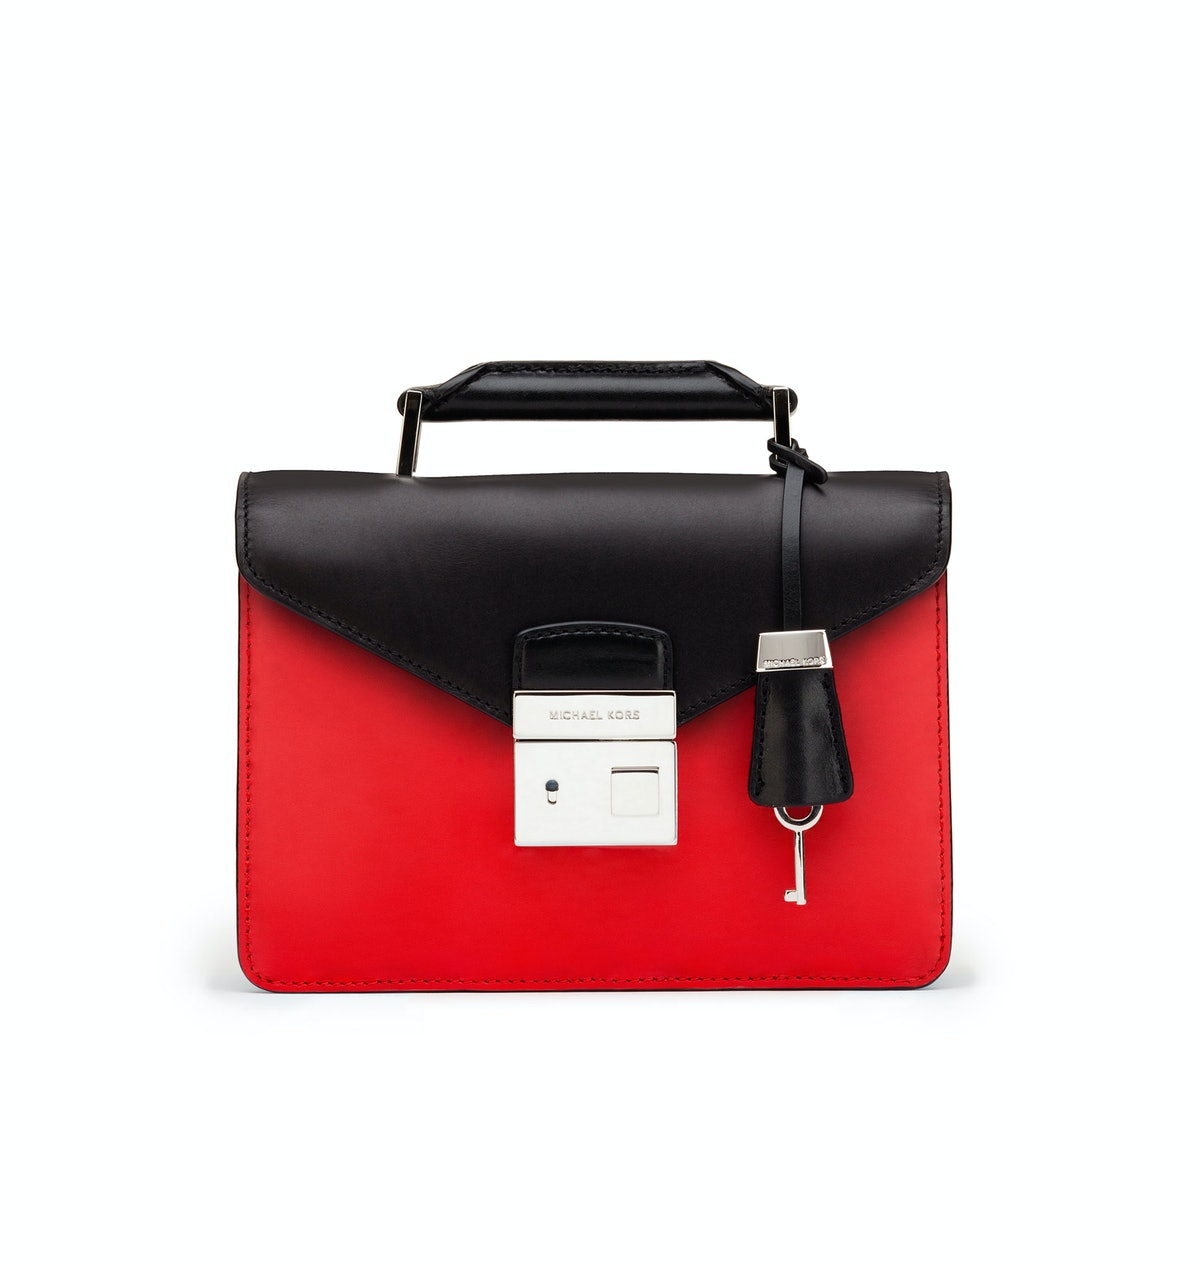 Michael Kors briefcase